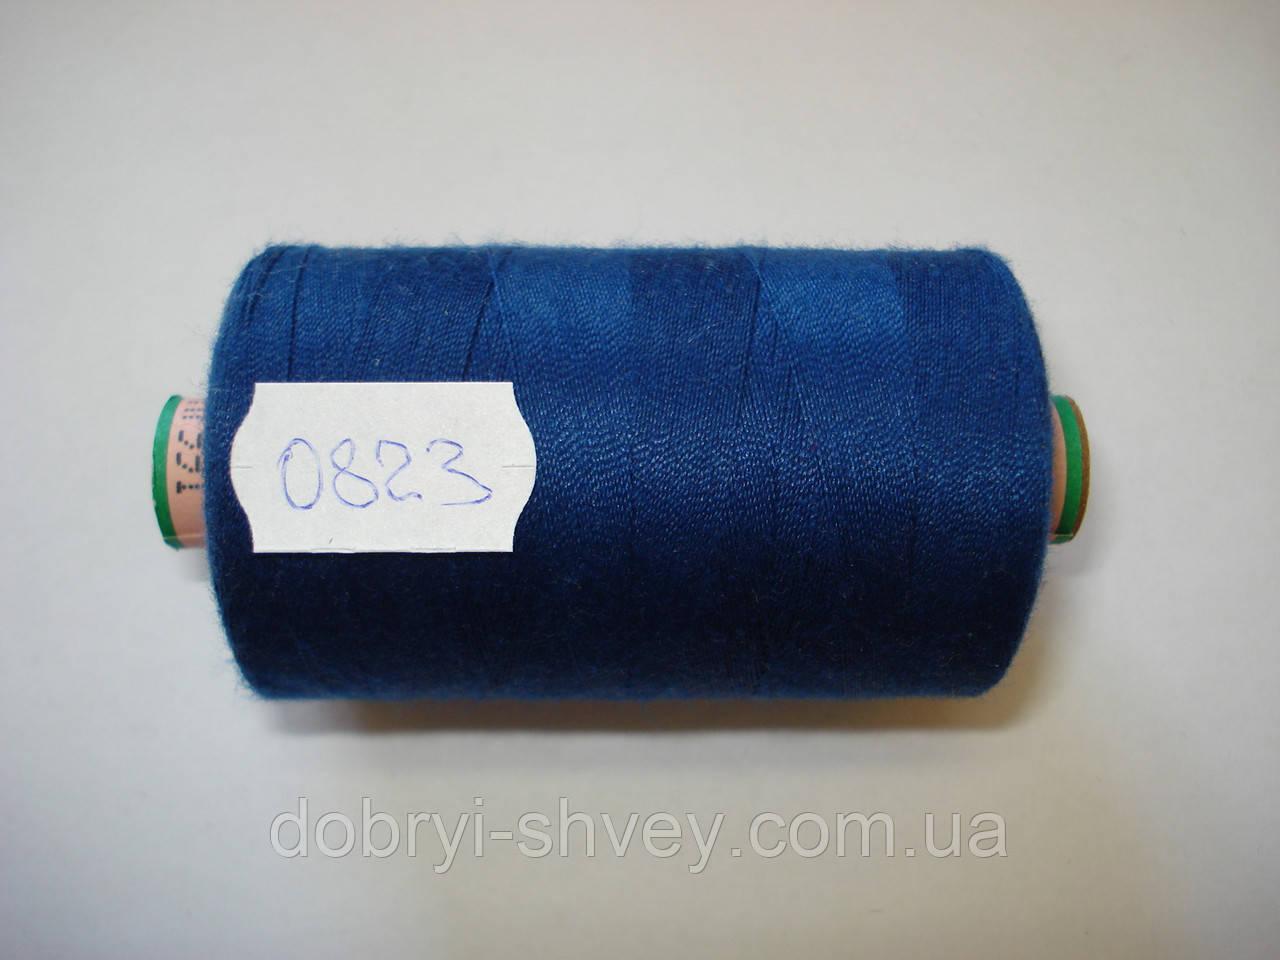 Нитка AMANN Saba c №80 1000м.col 0823 св.синий (шт.)